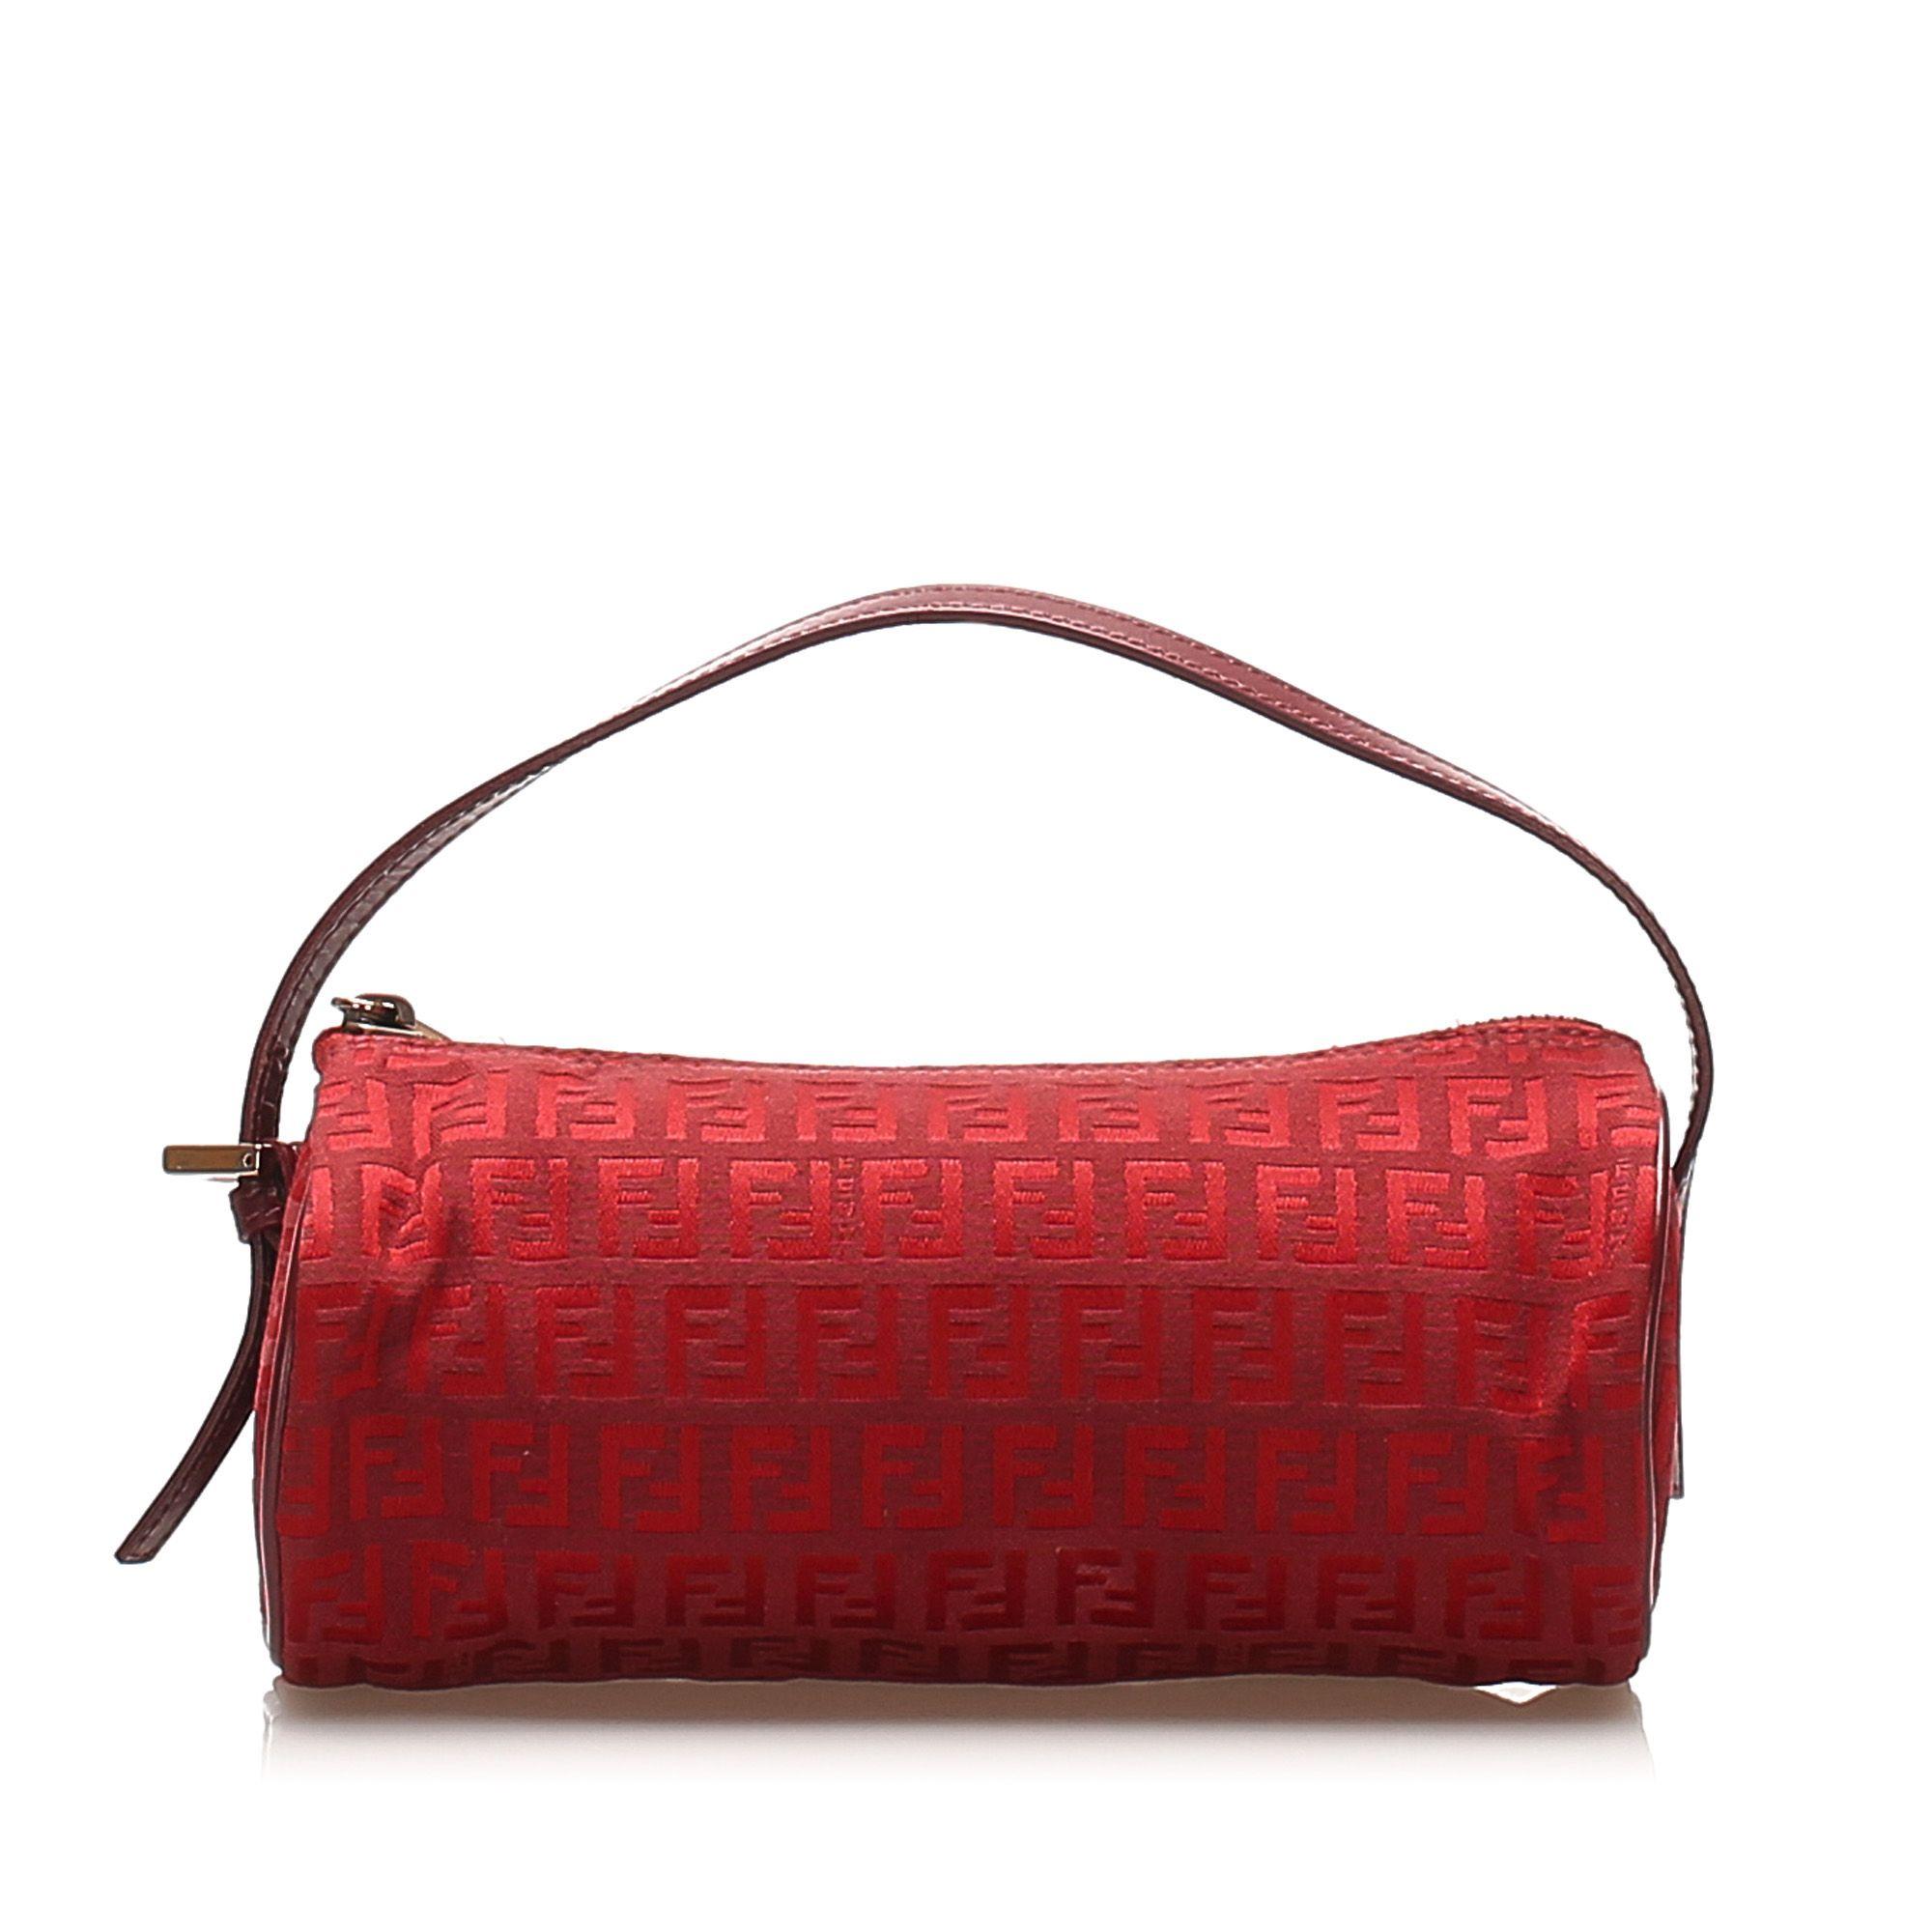 Vintage Fendi Zucchino Canvas Handbag Red